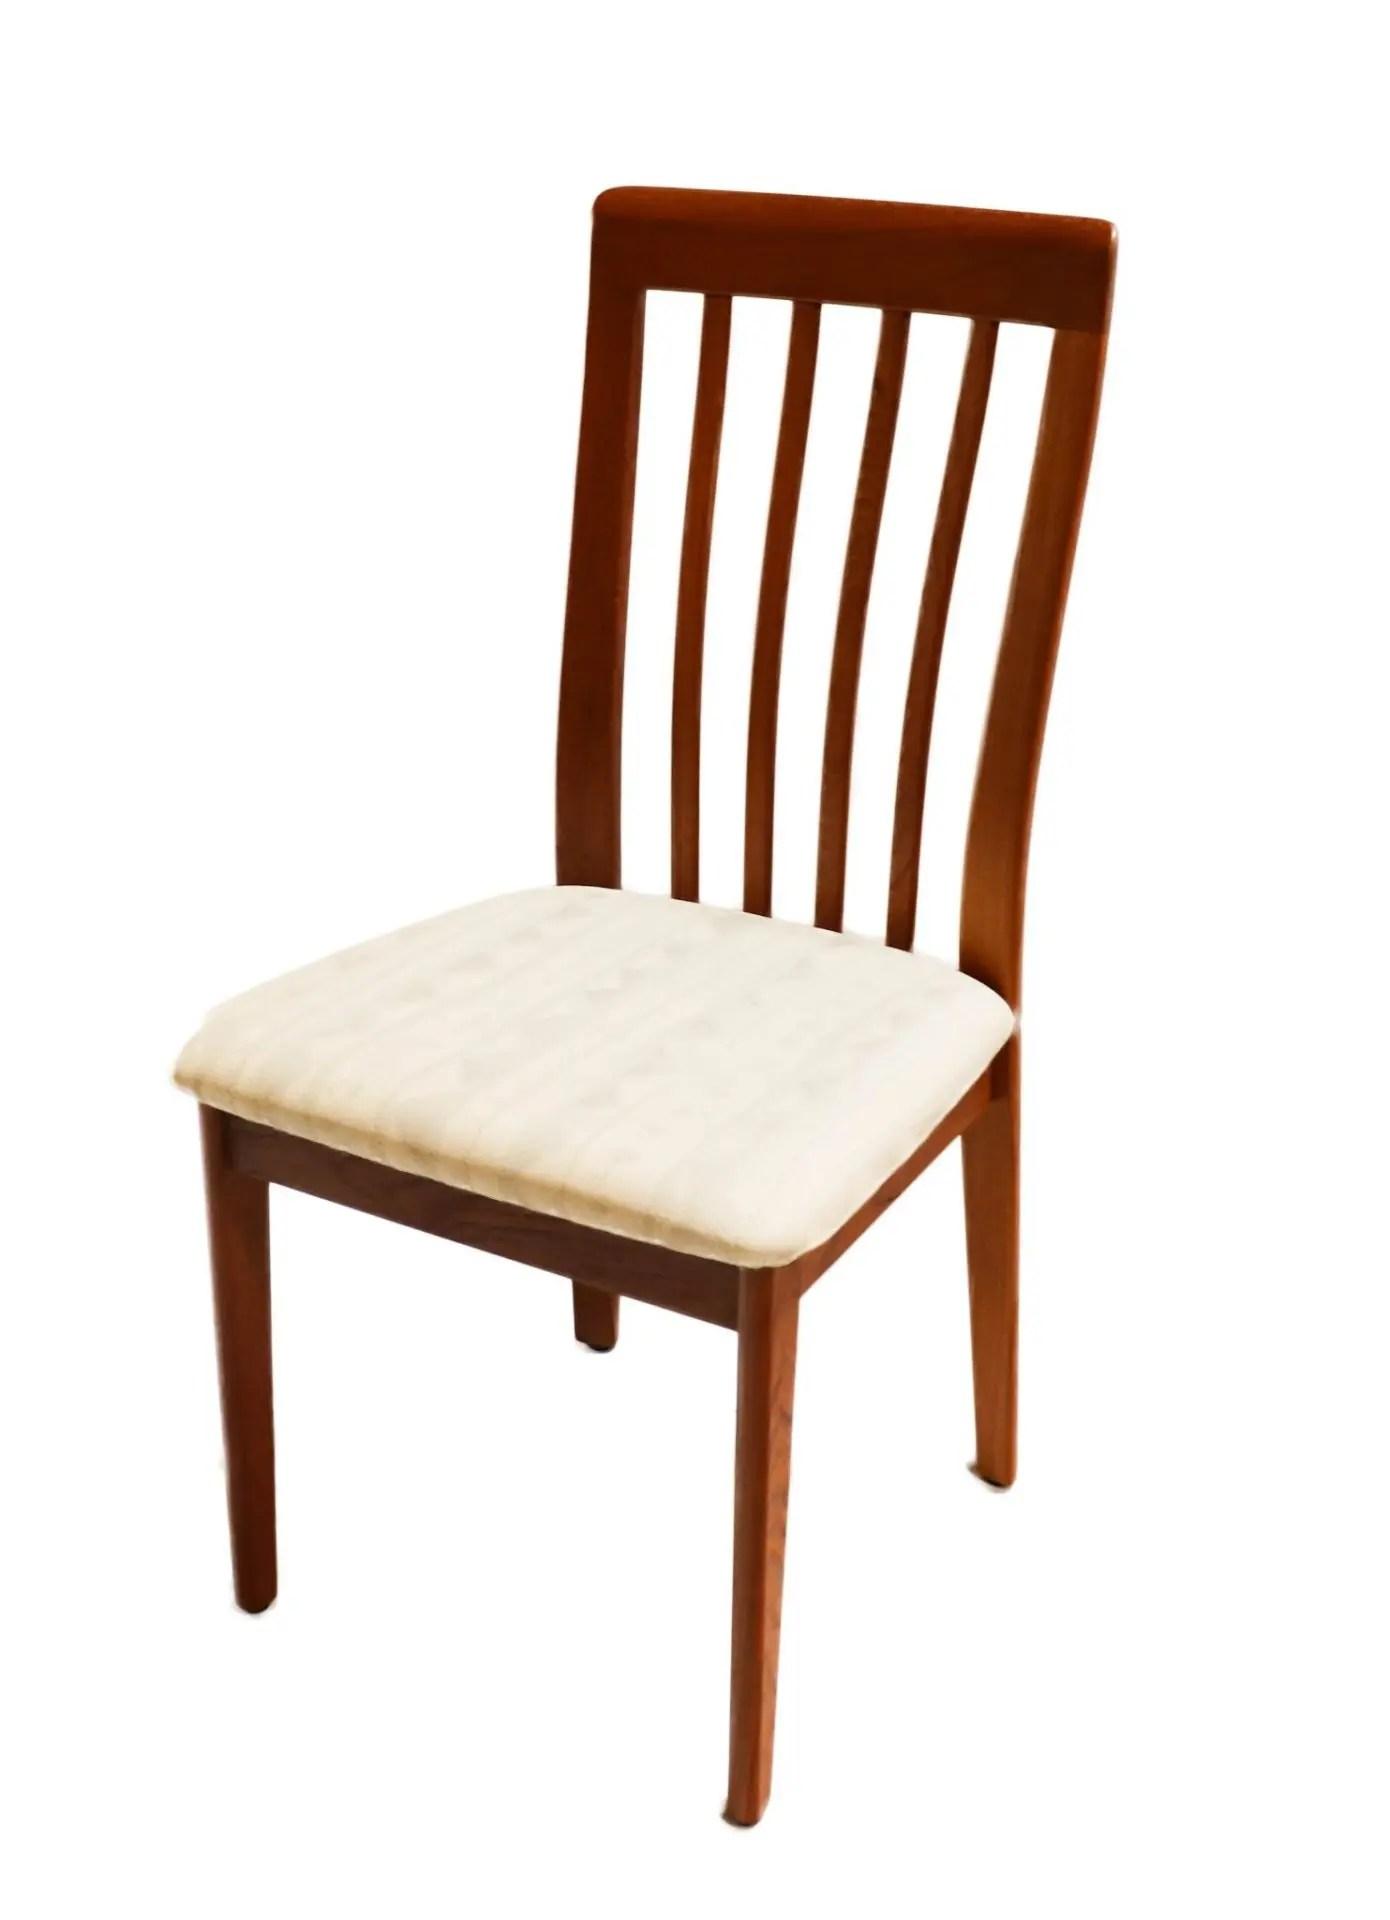 Danish Modern Teak dining chairs set of 6